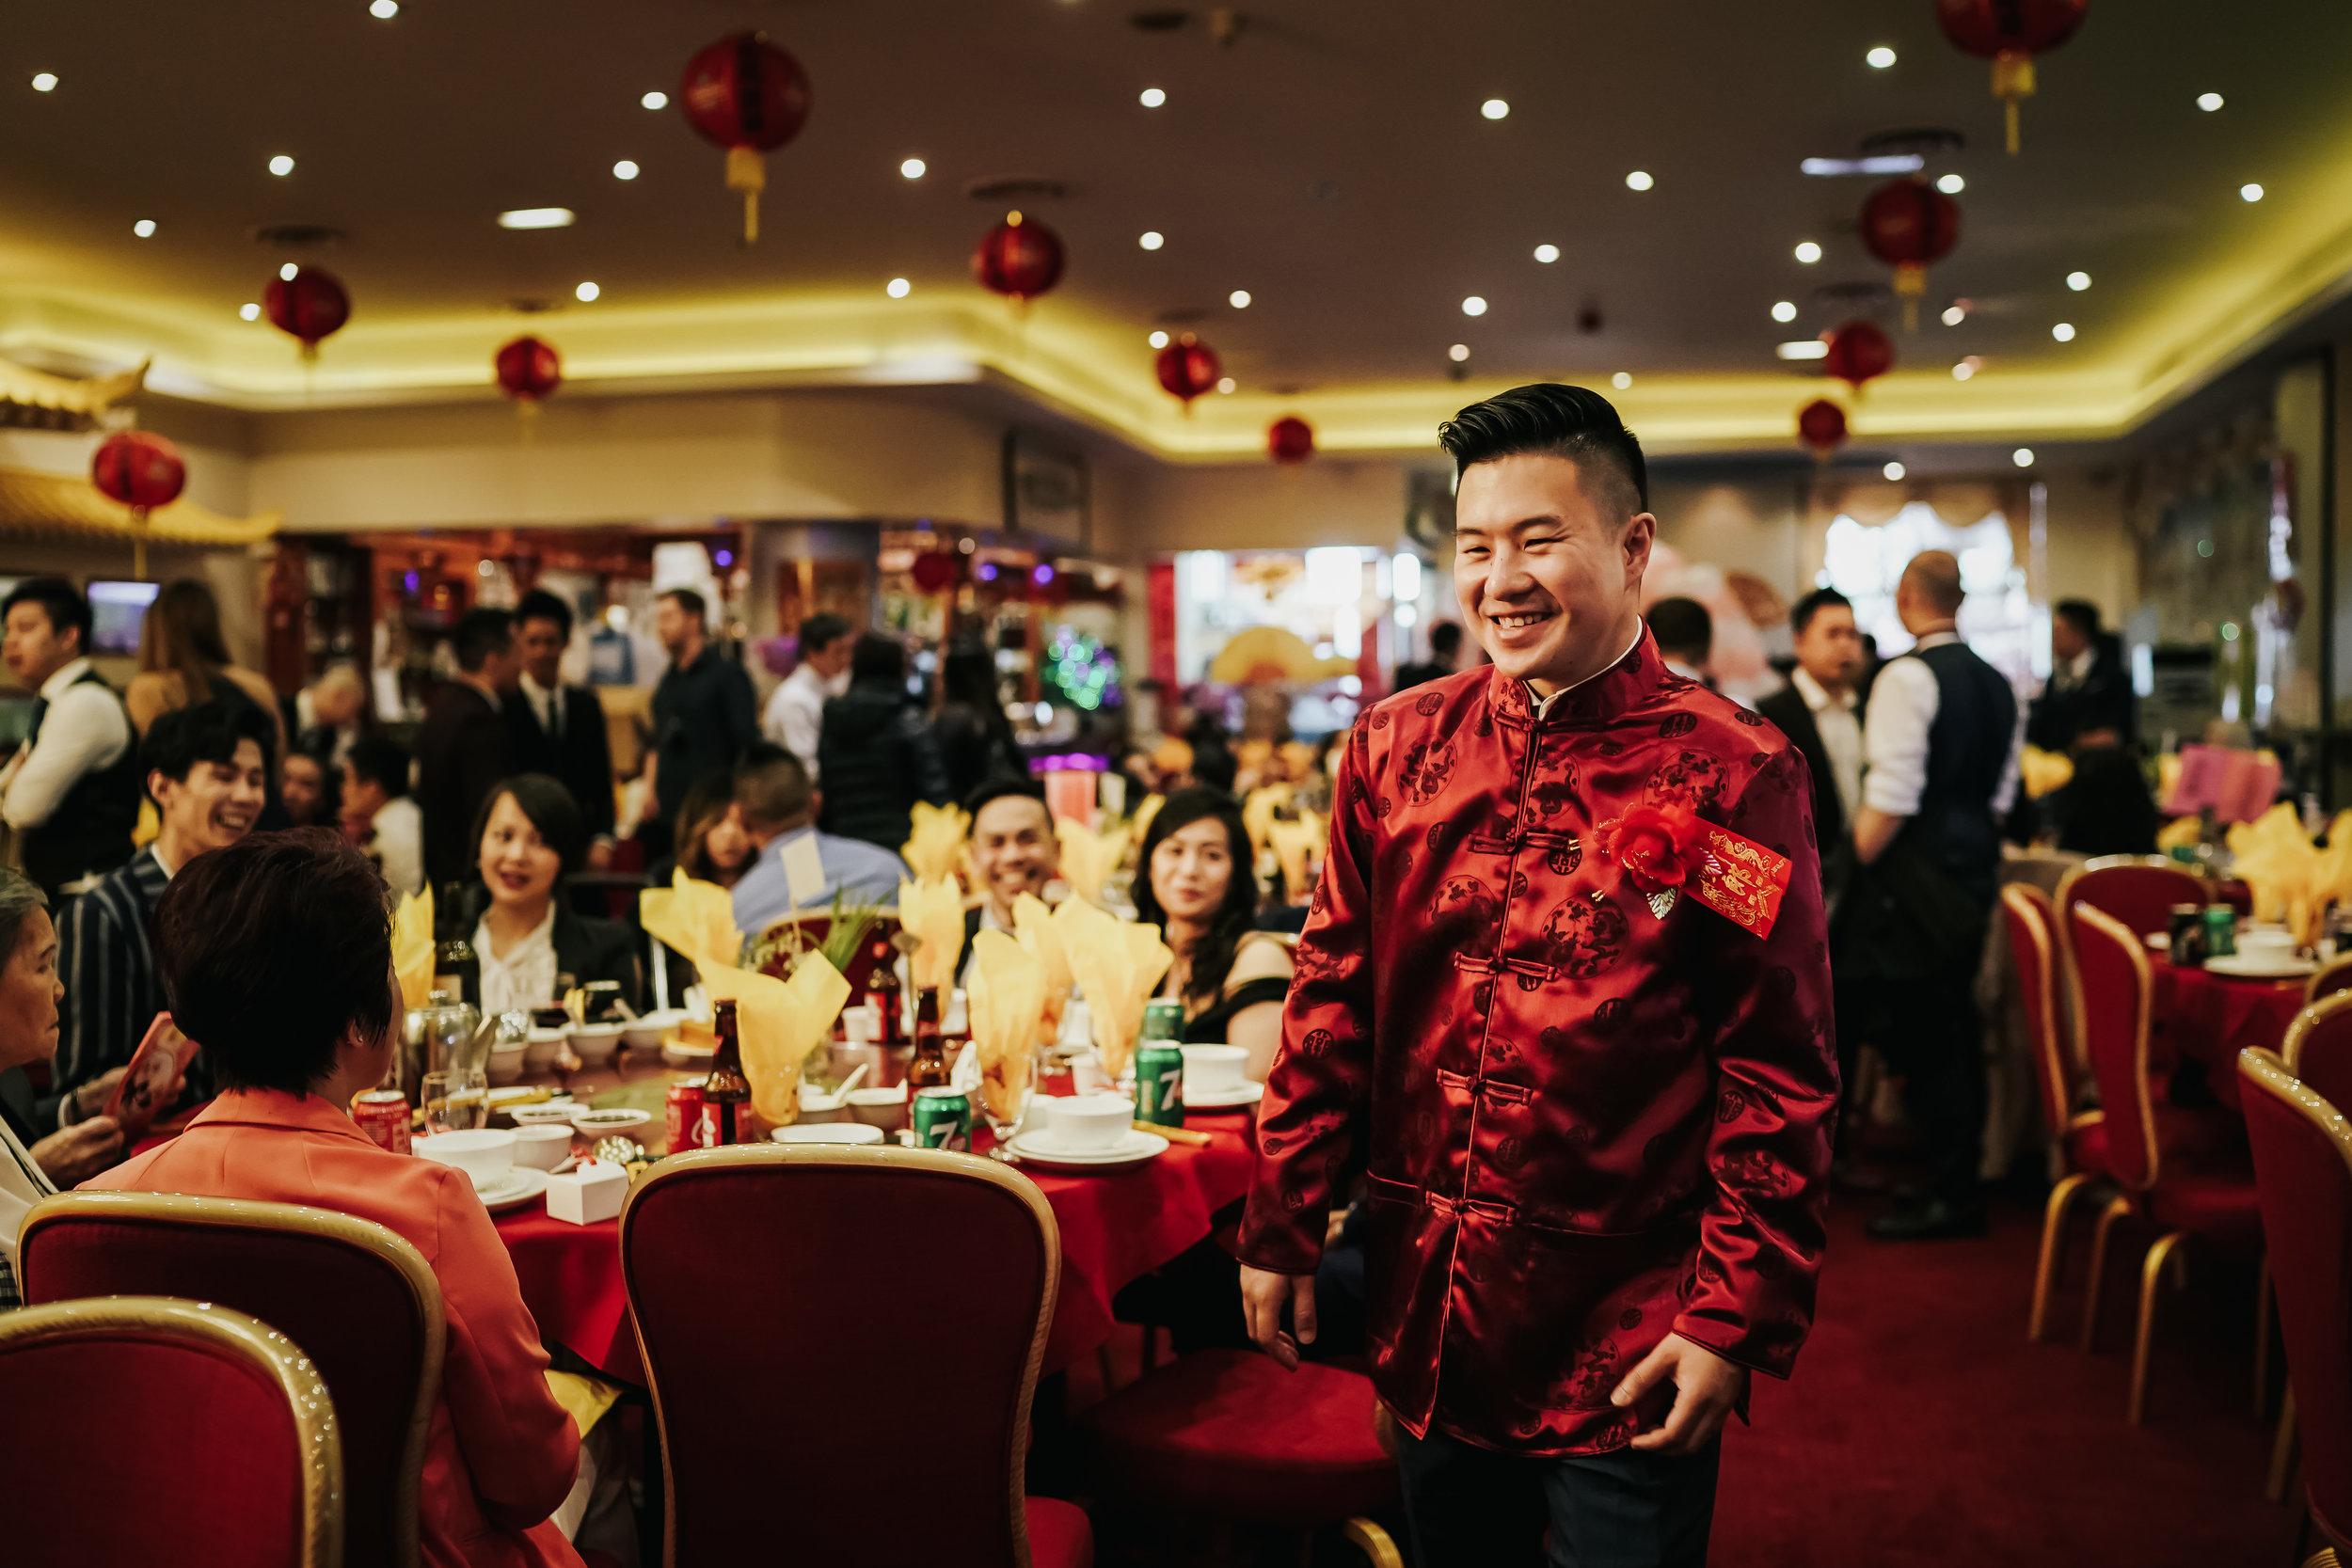 Chinese Wedding Photography Manchester wedding photographer Cheshire - 035.jpg